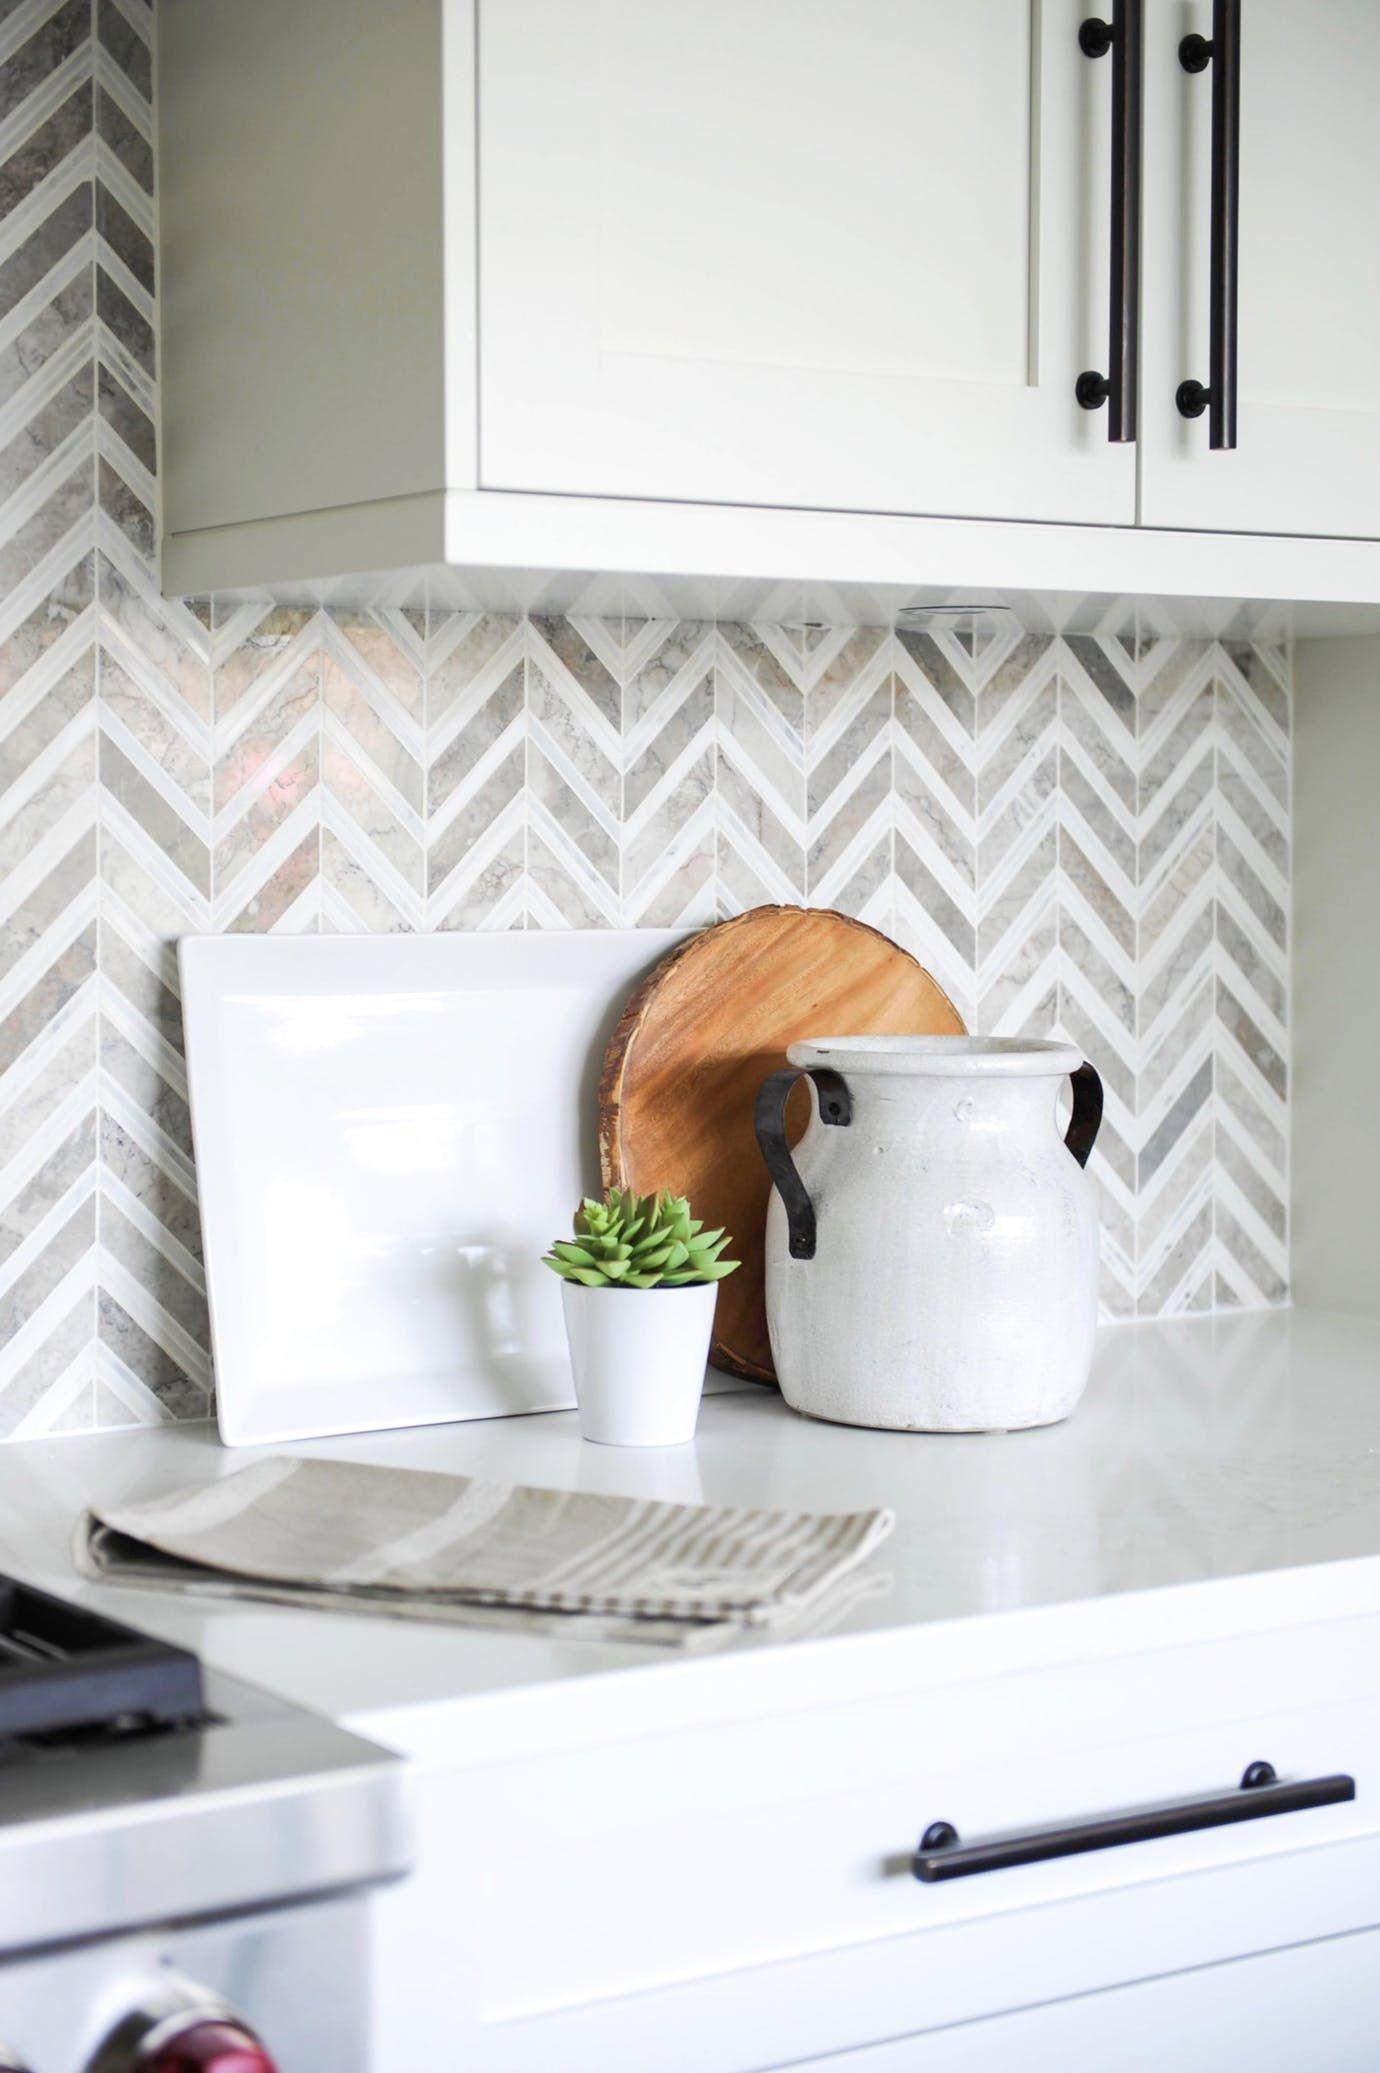 Modern Kitchen With Herringbone Backsplash Kitchen Contemporary Eclectic By Enviable Desi Herringbone Backsplash Kitchen Modern Kitchen Contemporary Kitchen